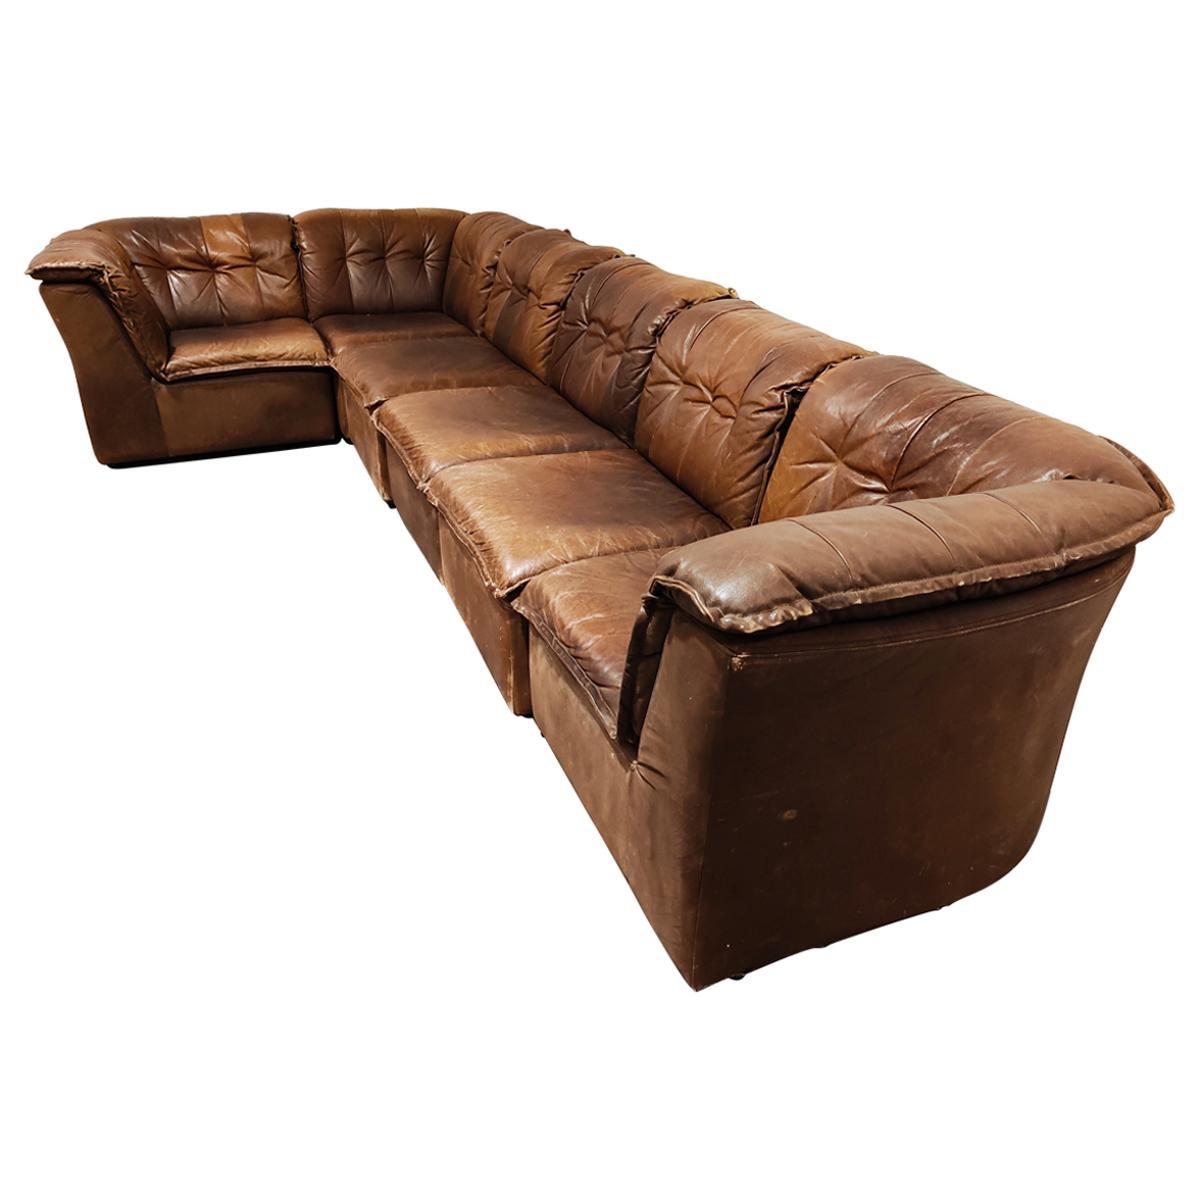 Vintage Brown Leather Modular Sofa, 1960s